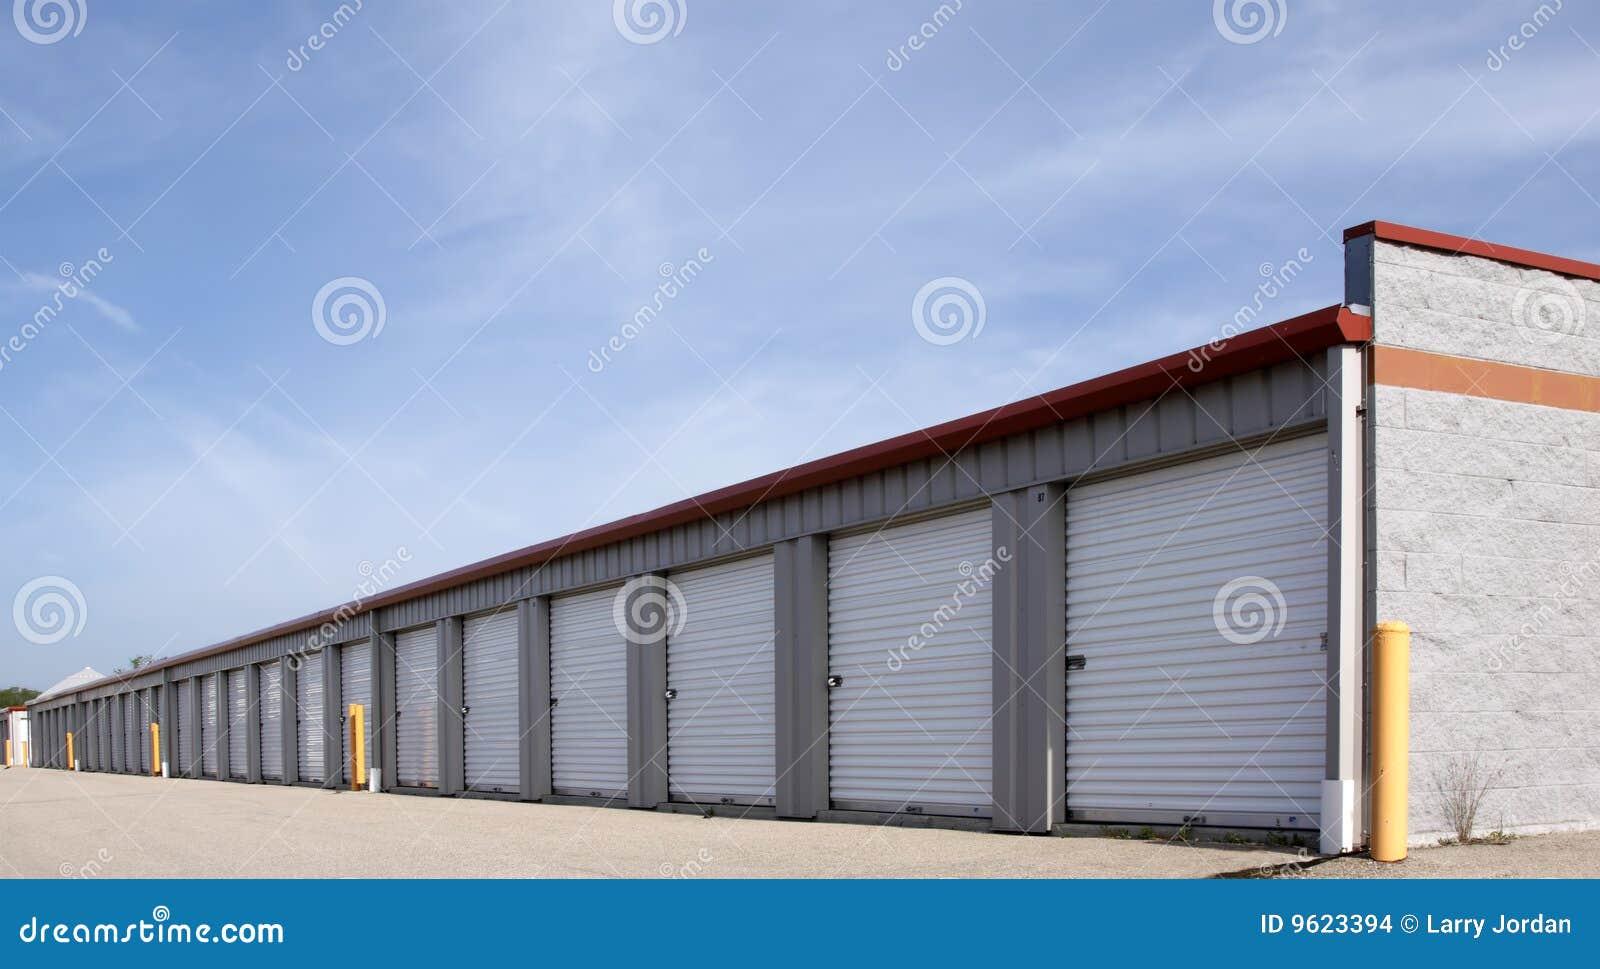 Unidades de almacenaje de alquiler